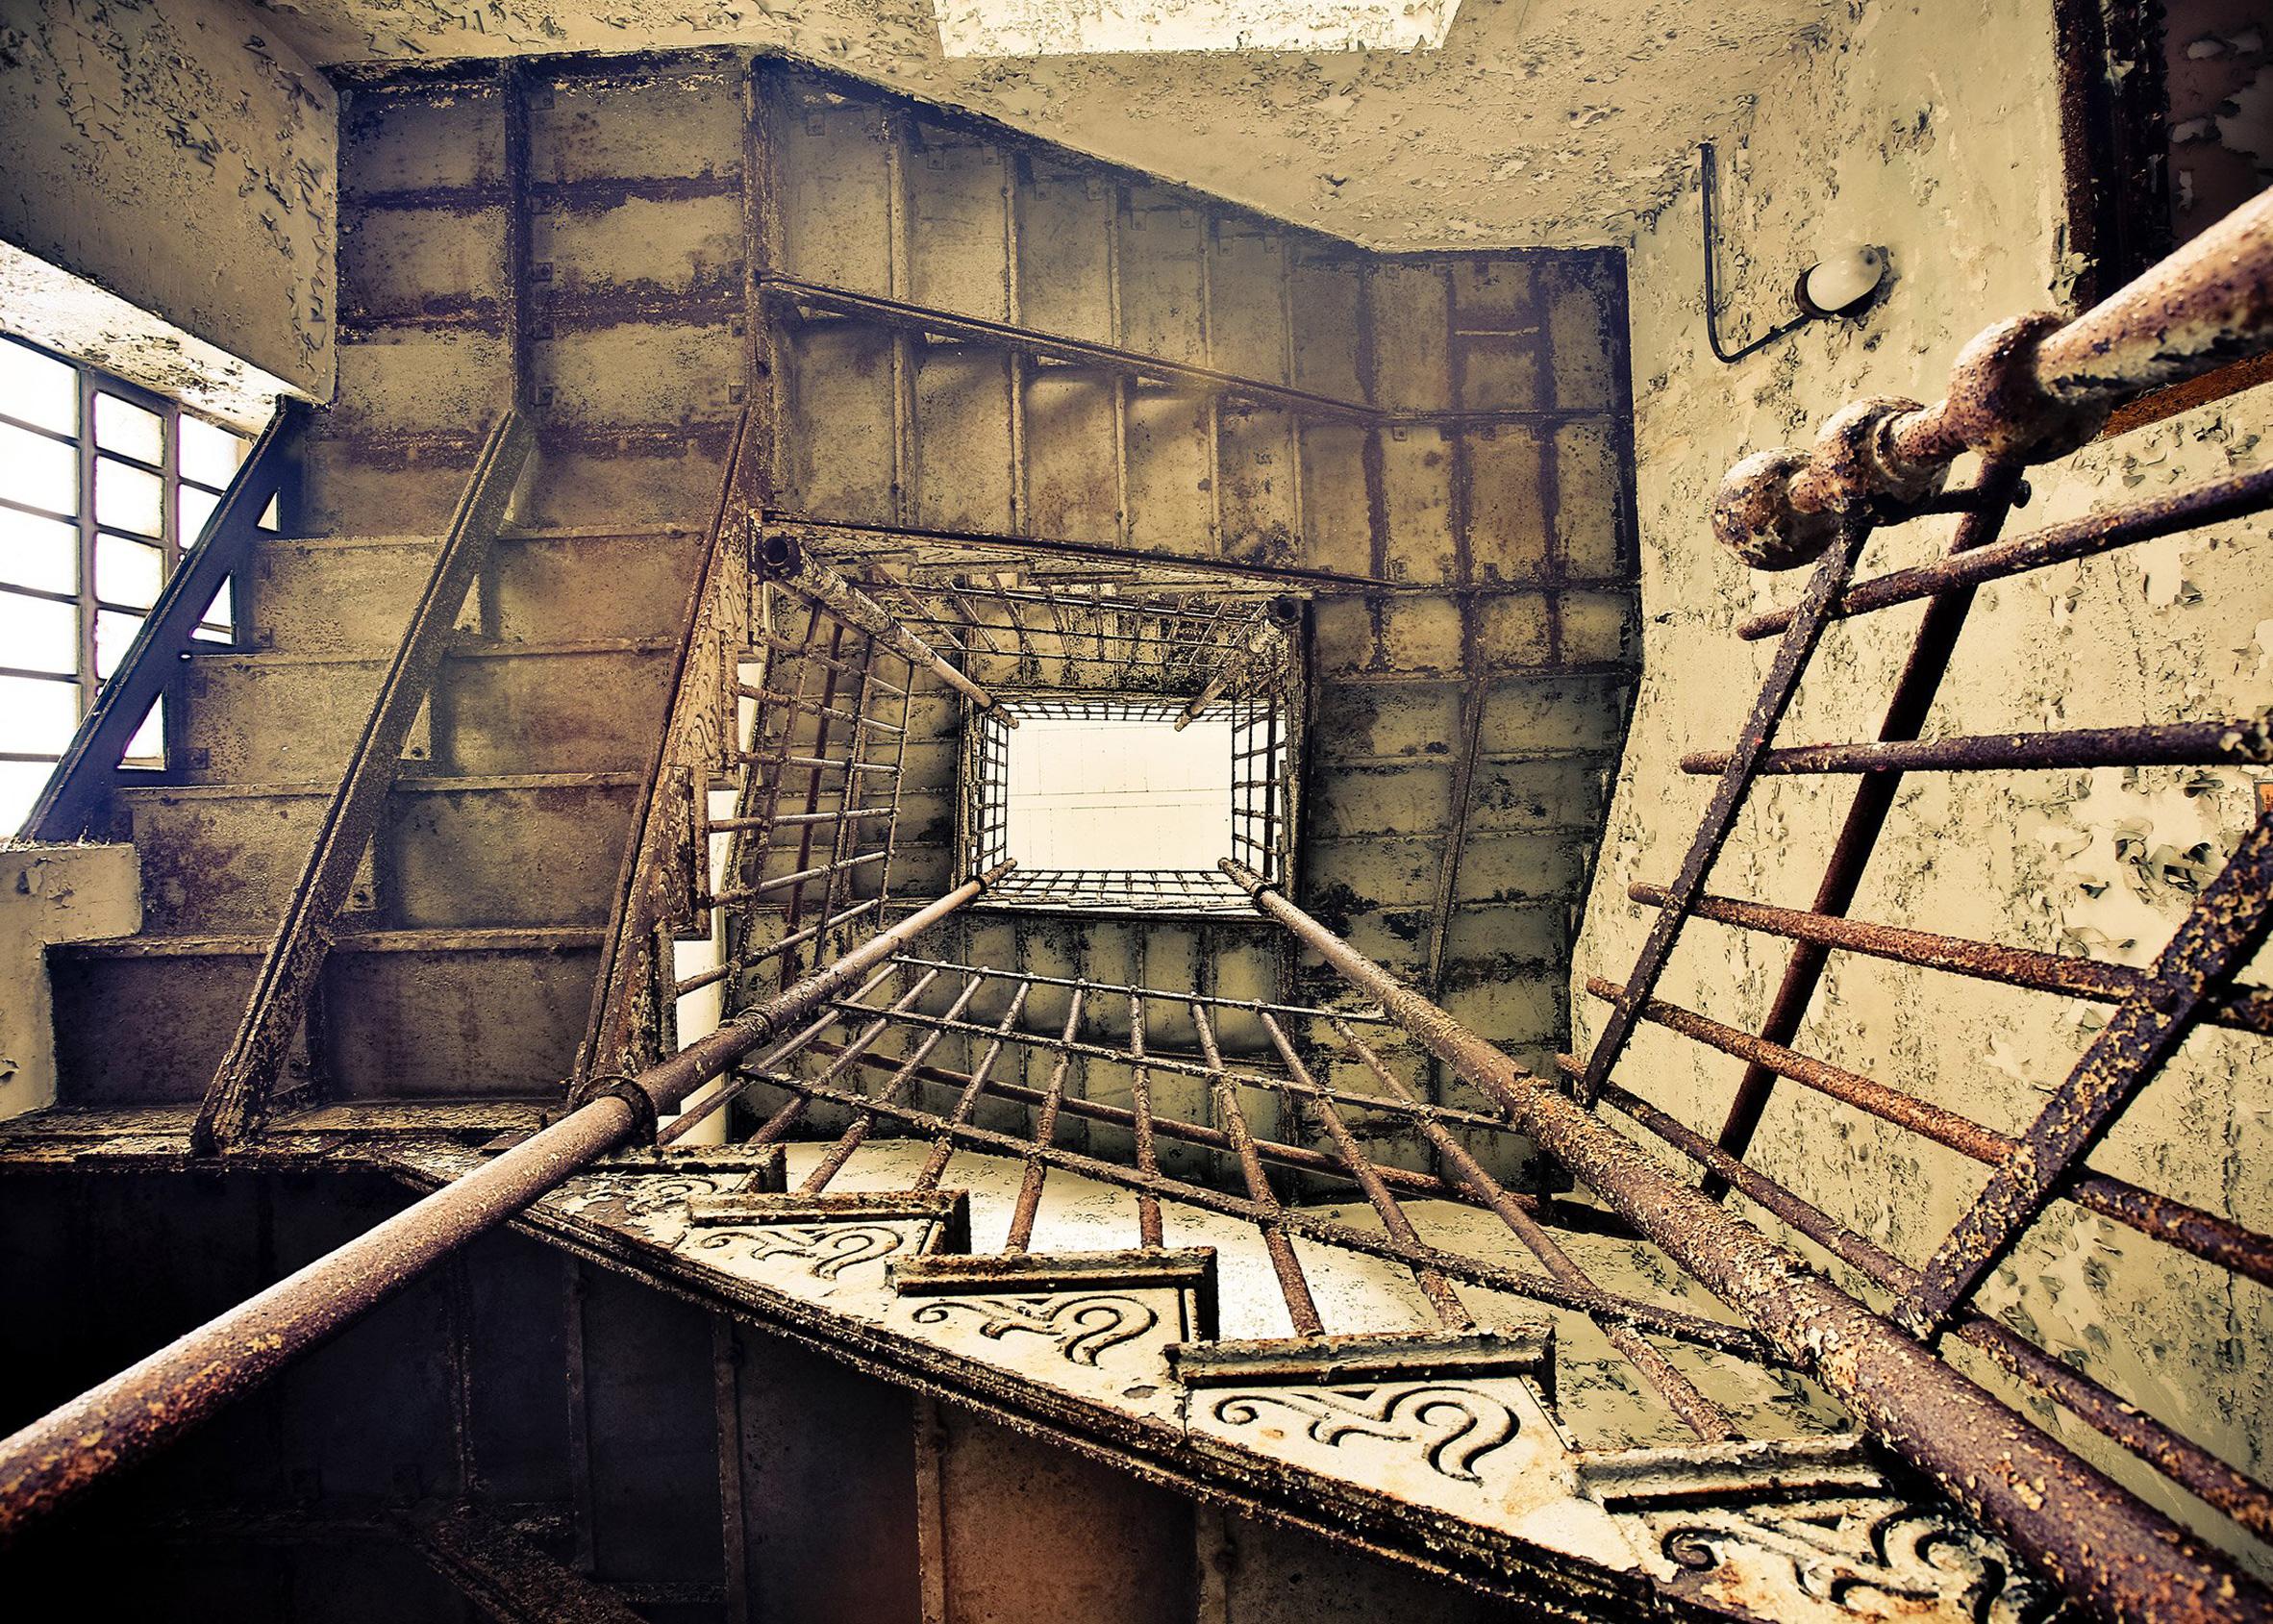 Abandoned Asylums by Matt van der Velde